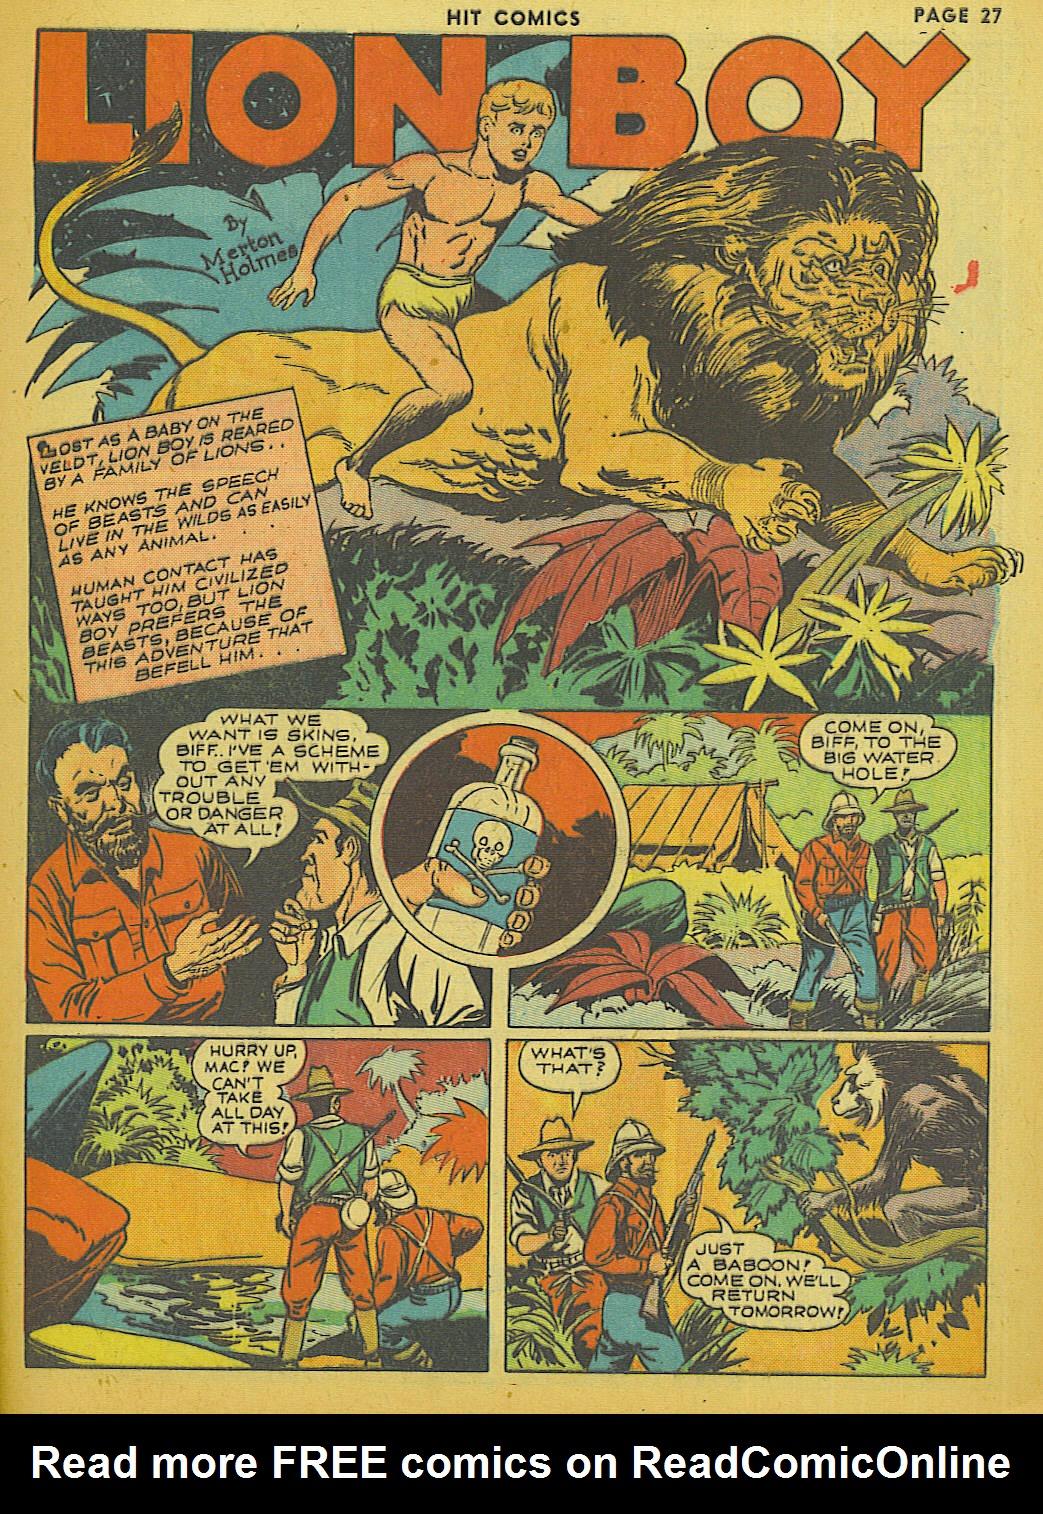 Read online Hit Comics comic -  Issue #13 - 29